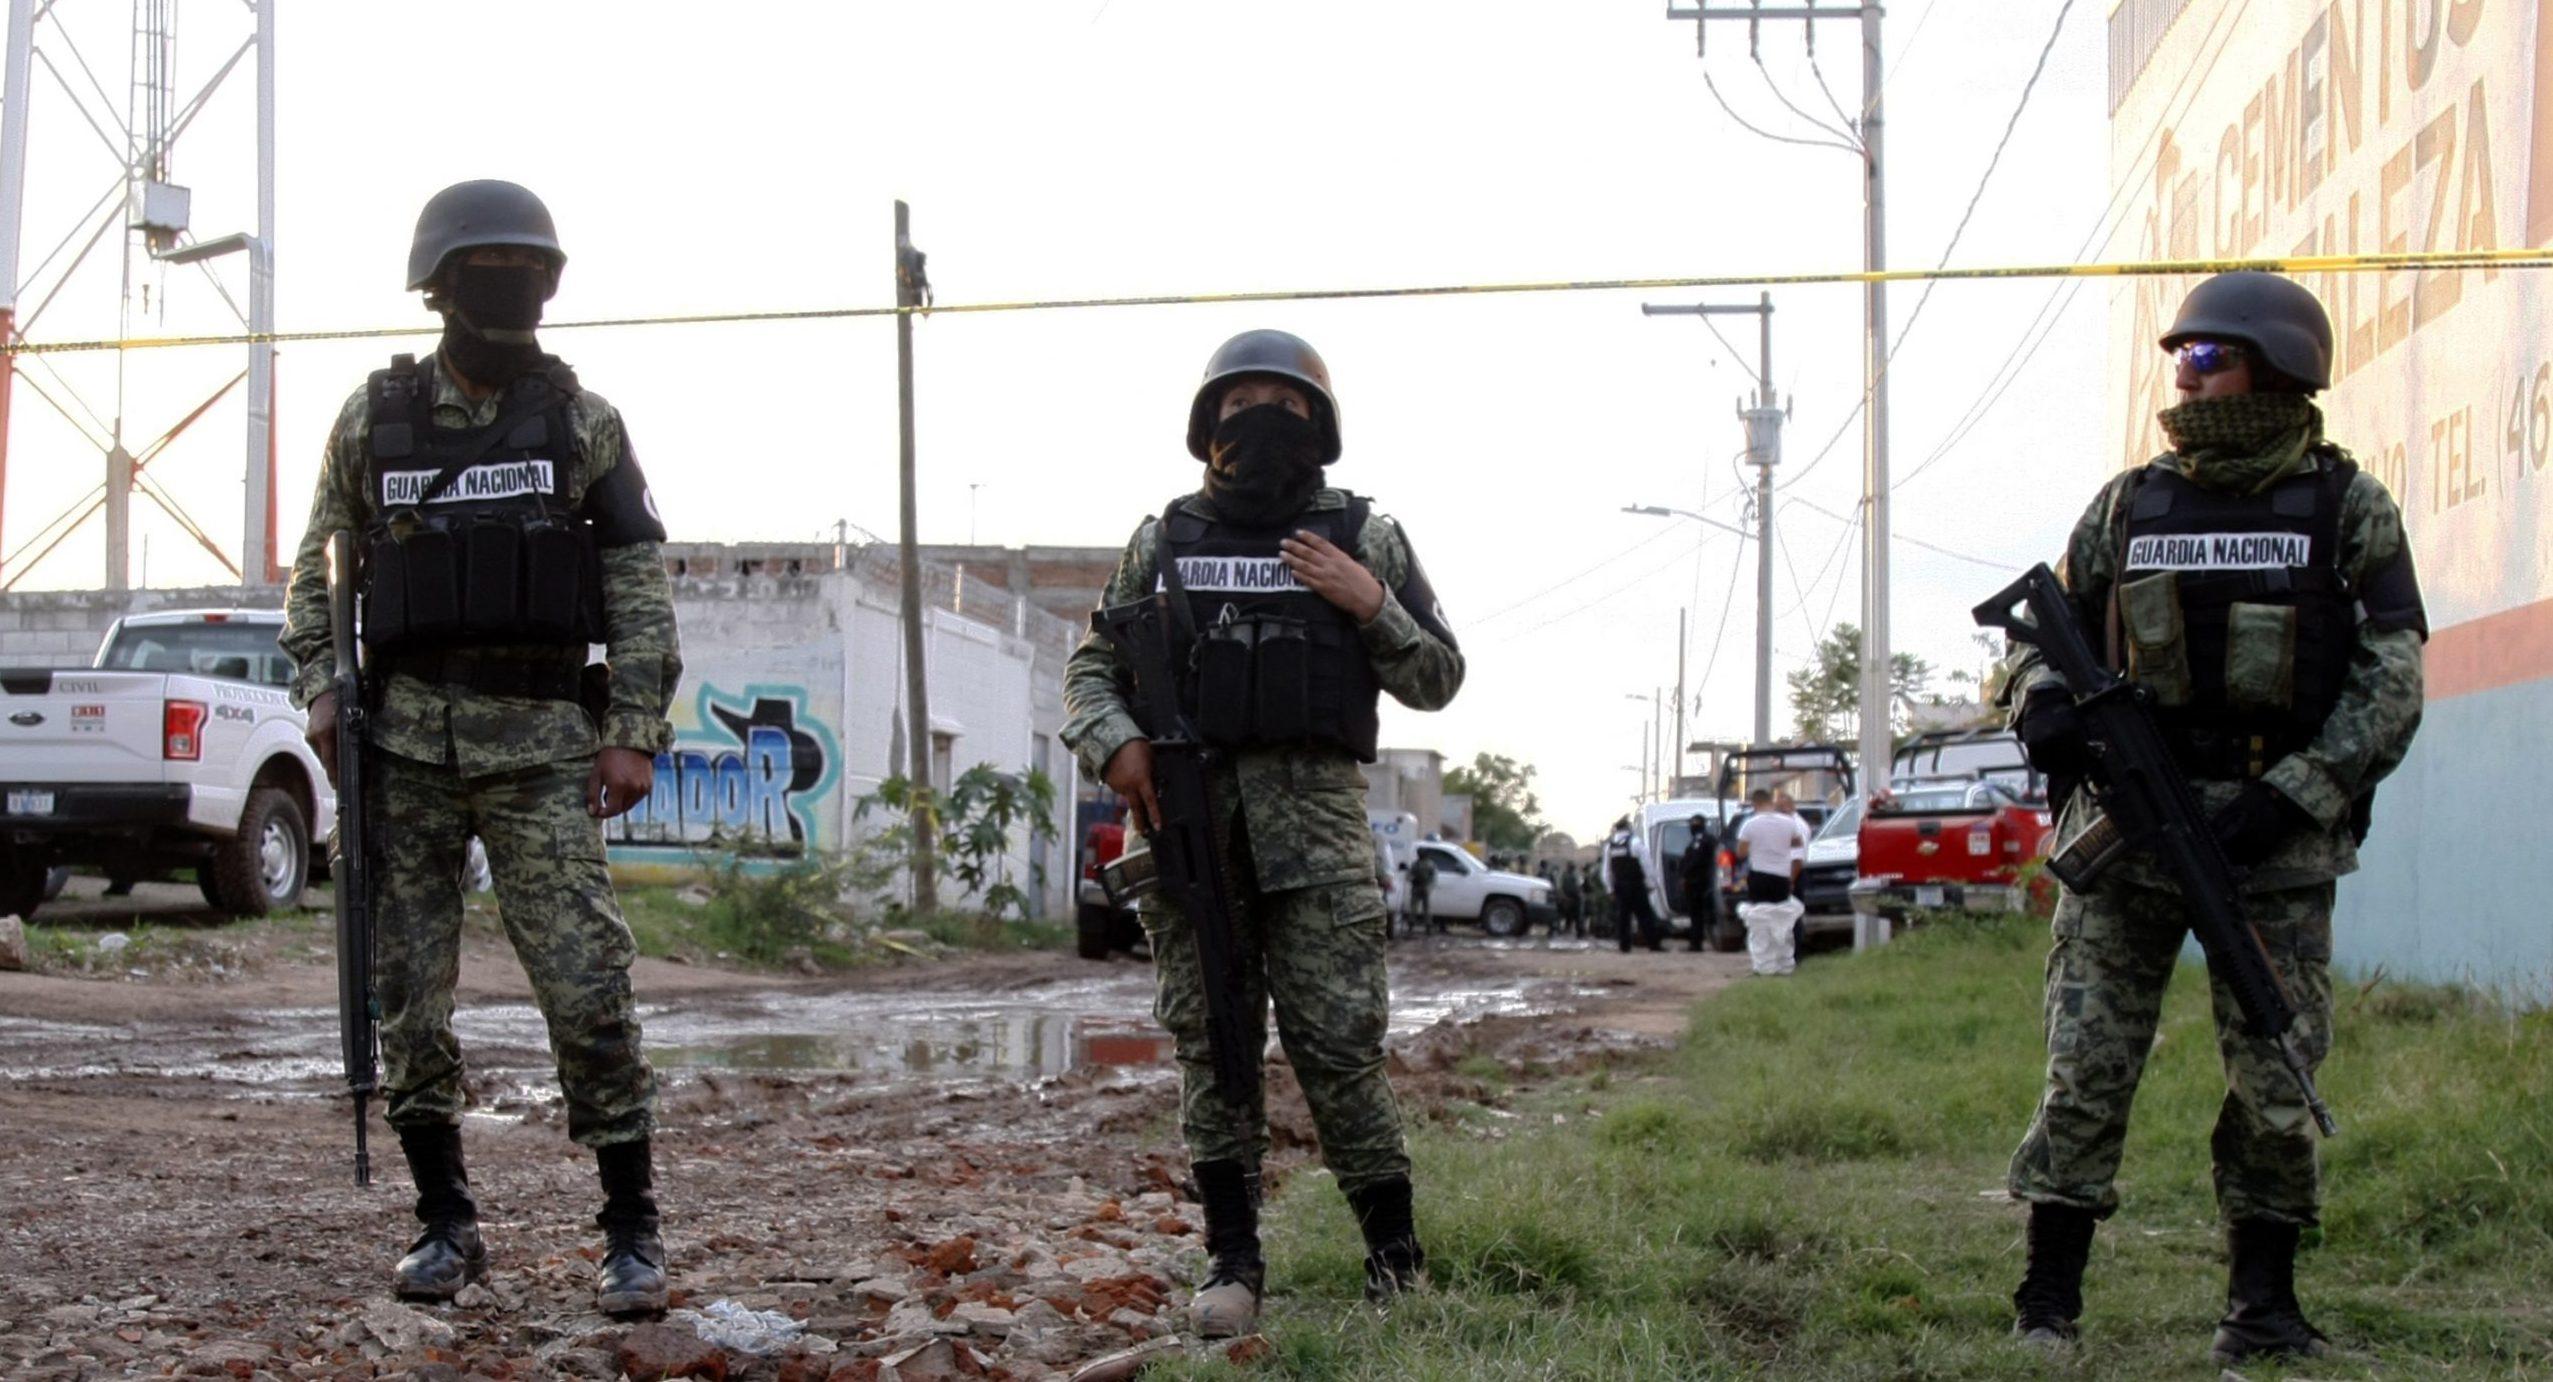 allbet登陆官网:墨西哥瓜纳华托州发生暴力袭警事宜 5名警员身亡